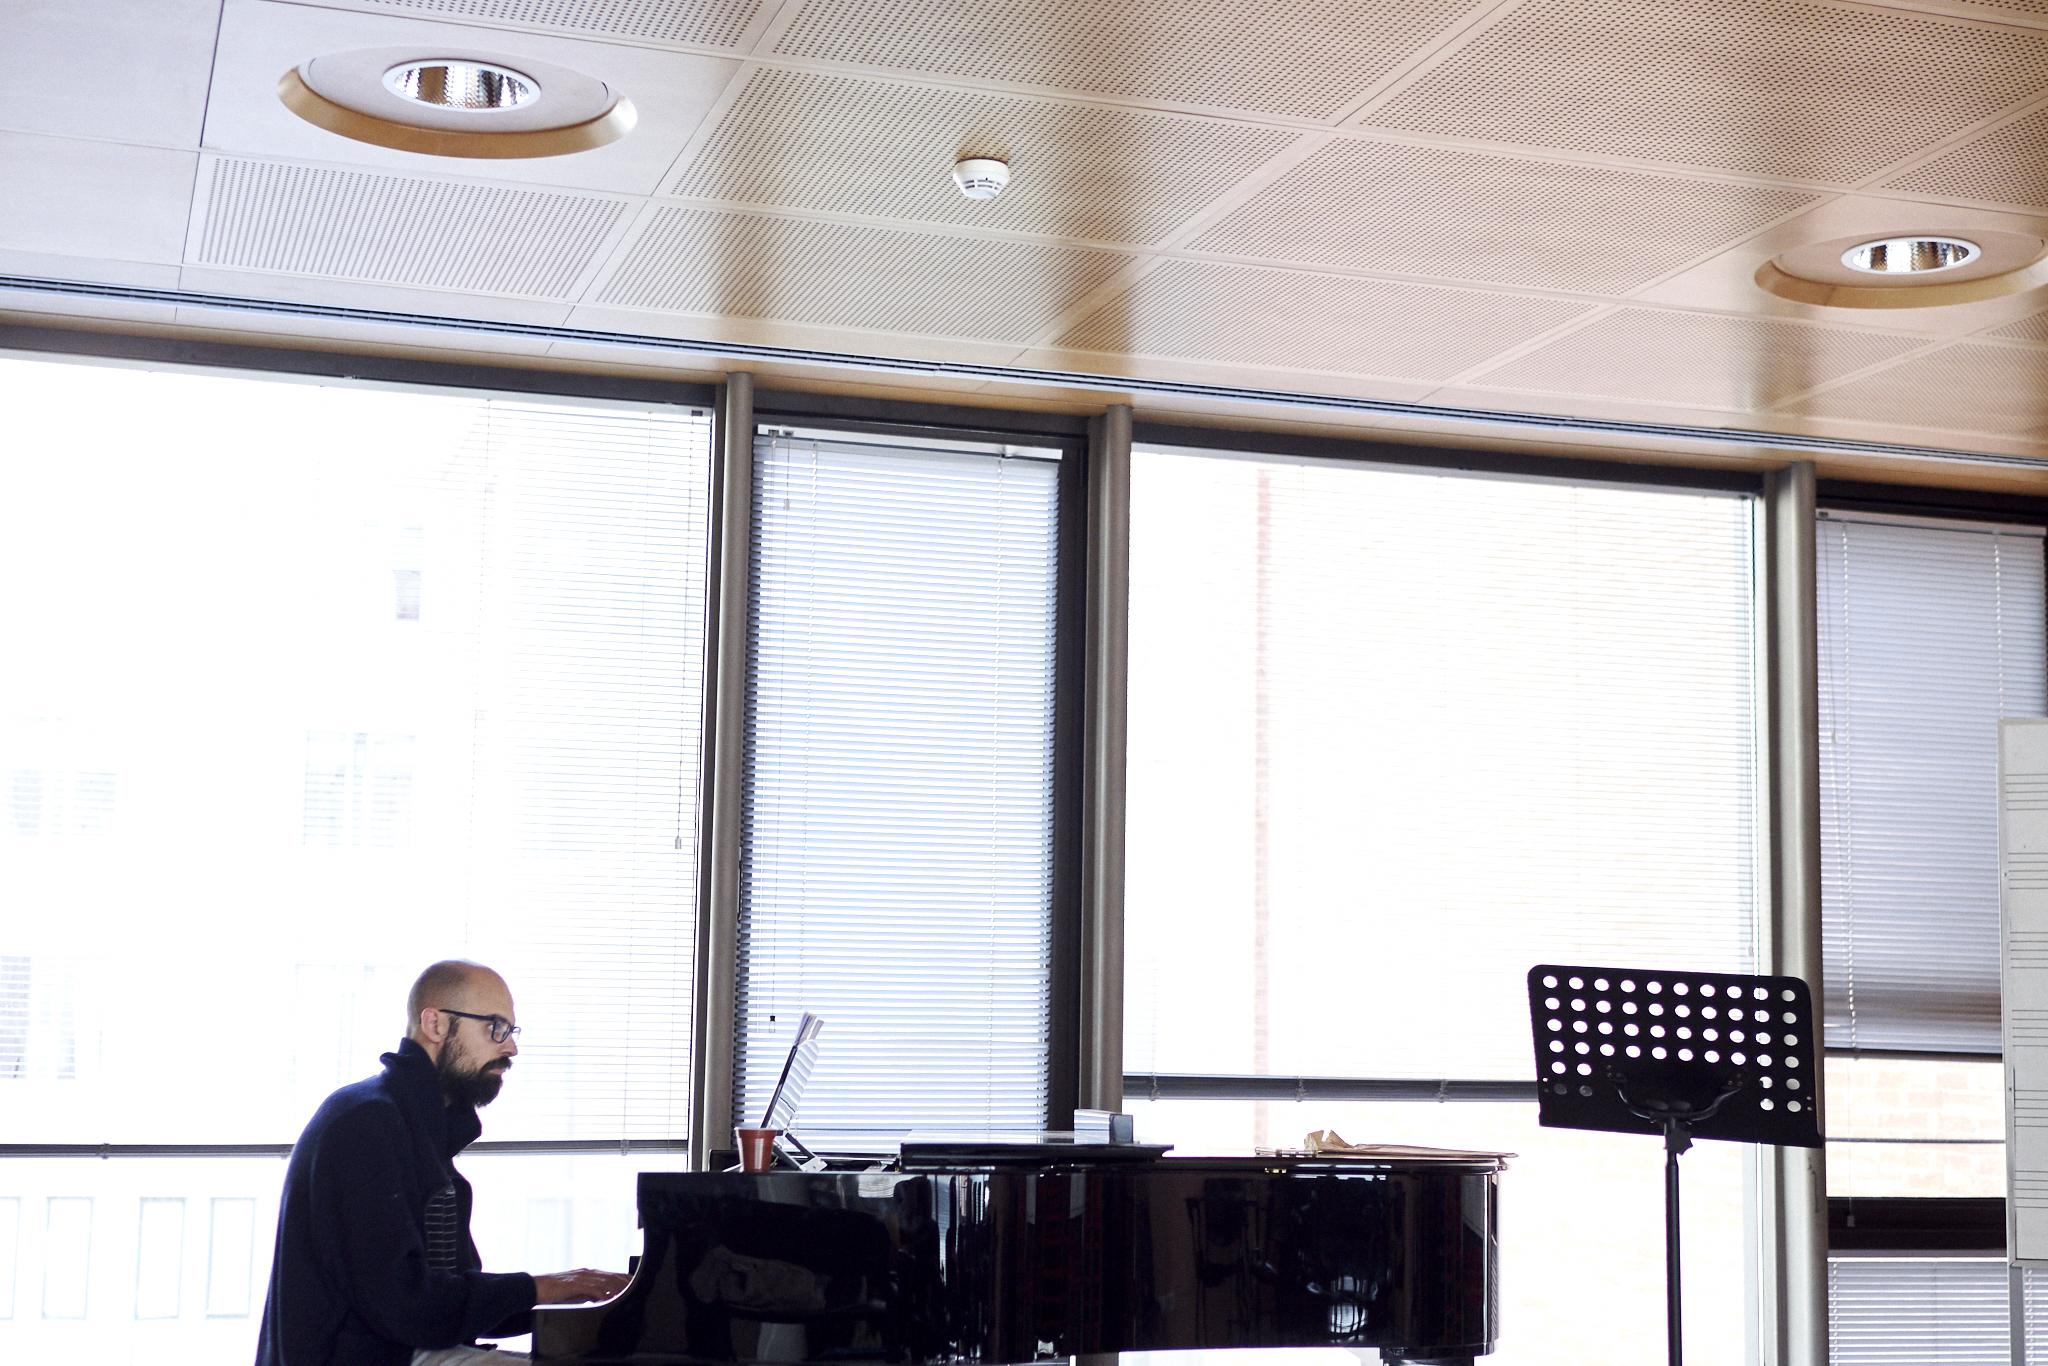 Fotografo de Musicos Barcelona _LME3649.jpg